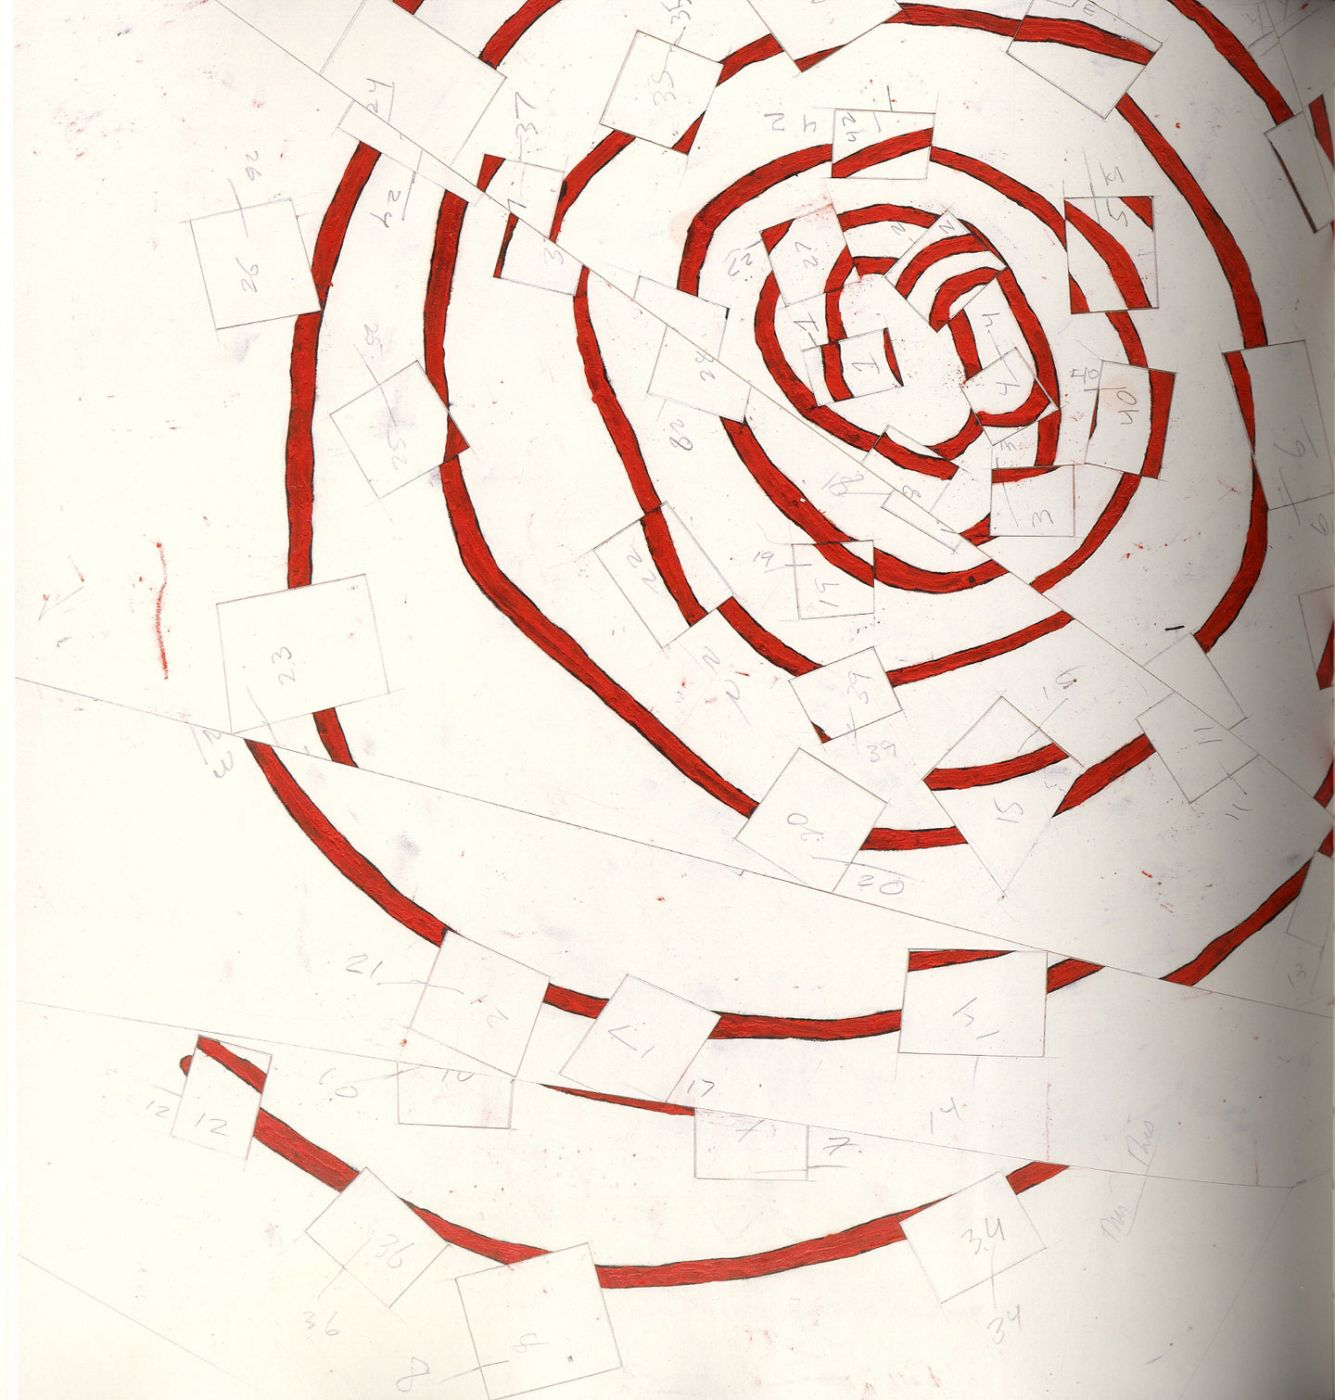 1335x1400 Roni Horn 153 Drawings Roni Horn, Tacita, Dean, Briony, Fer